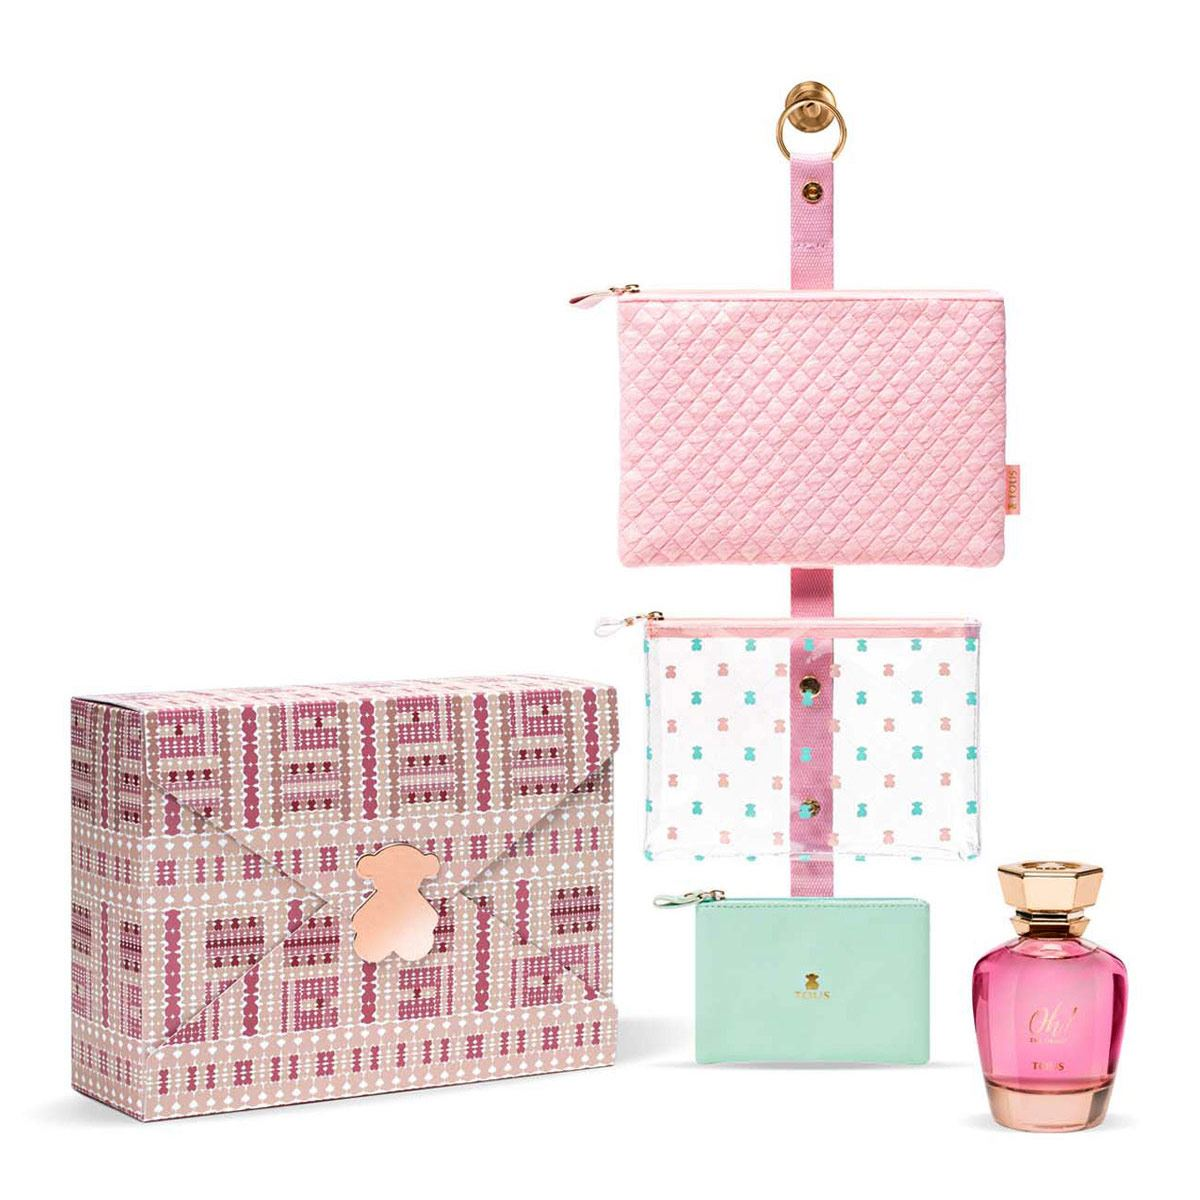 Tous Oh! The Origin Estuche  Eau de Parfum 100 ml + Trio Neceseres